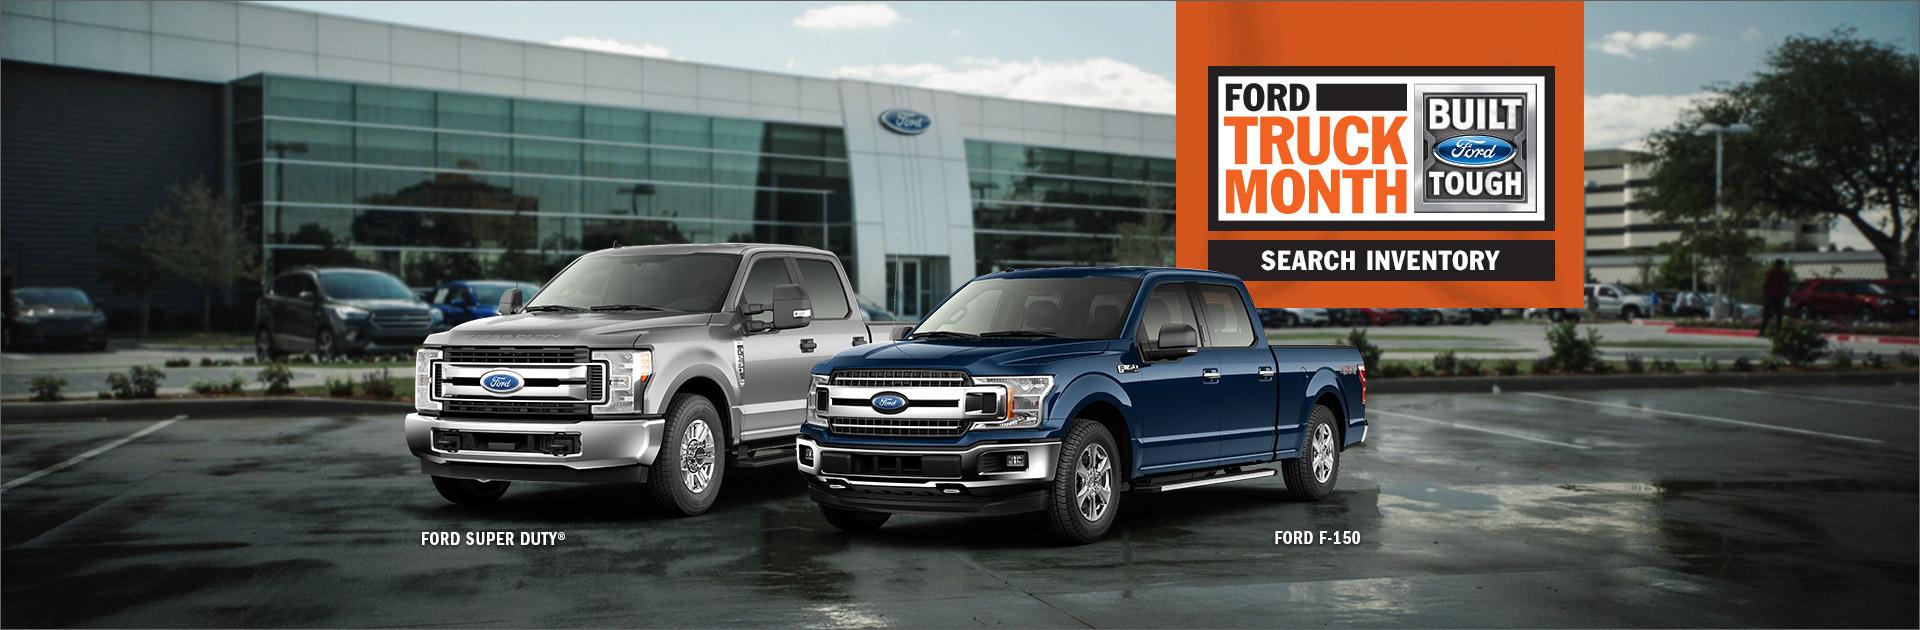 Mack Grubbs Ford >> Mack Grubbs Ford Inc